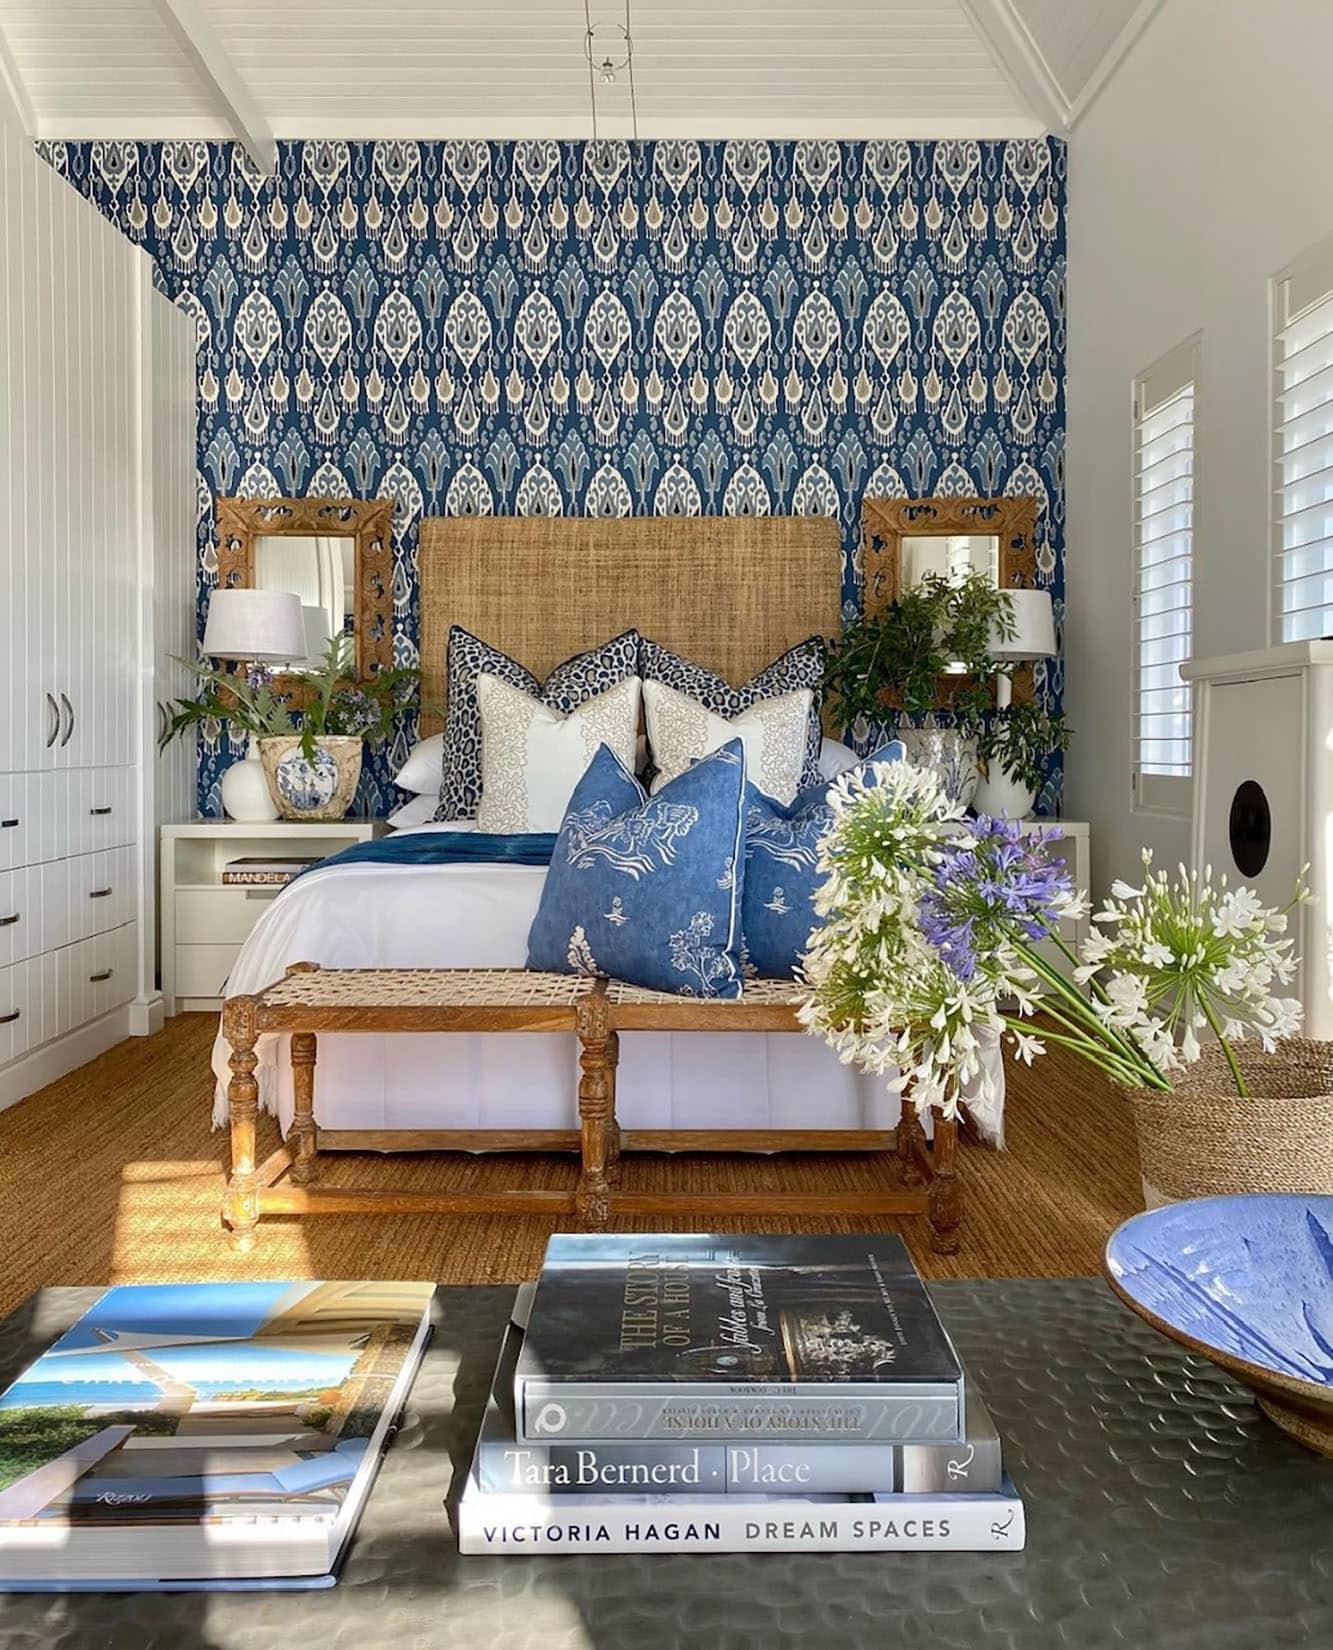 sue bond bedroom in her Thesans Island Retreat